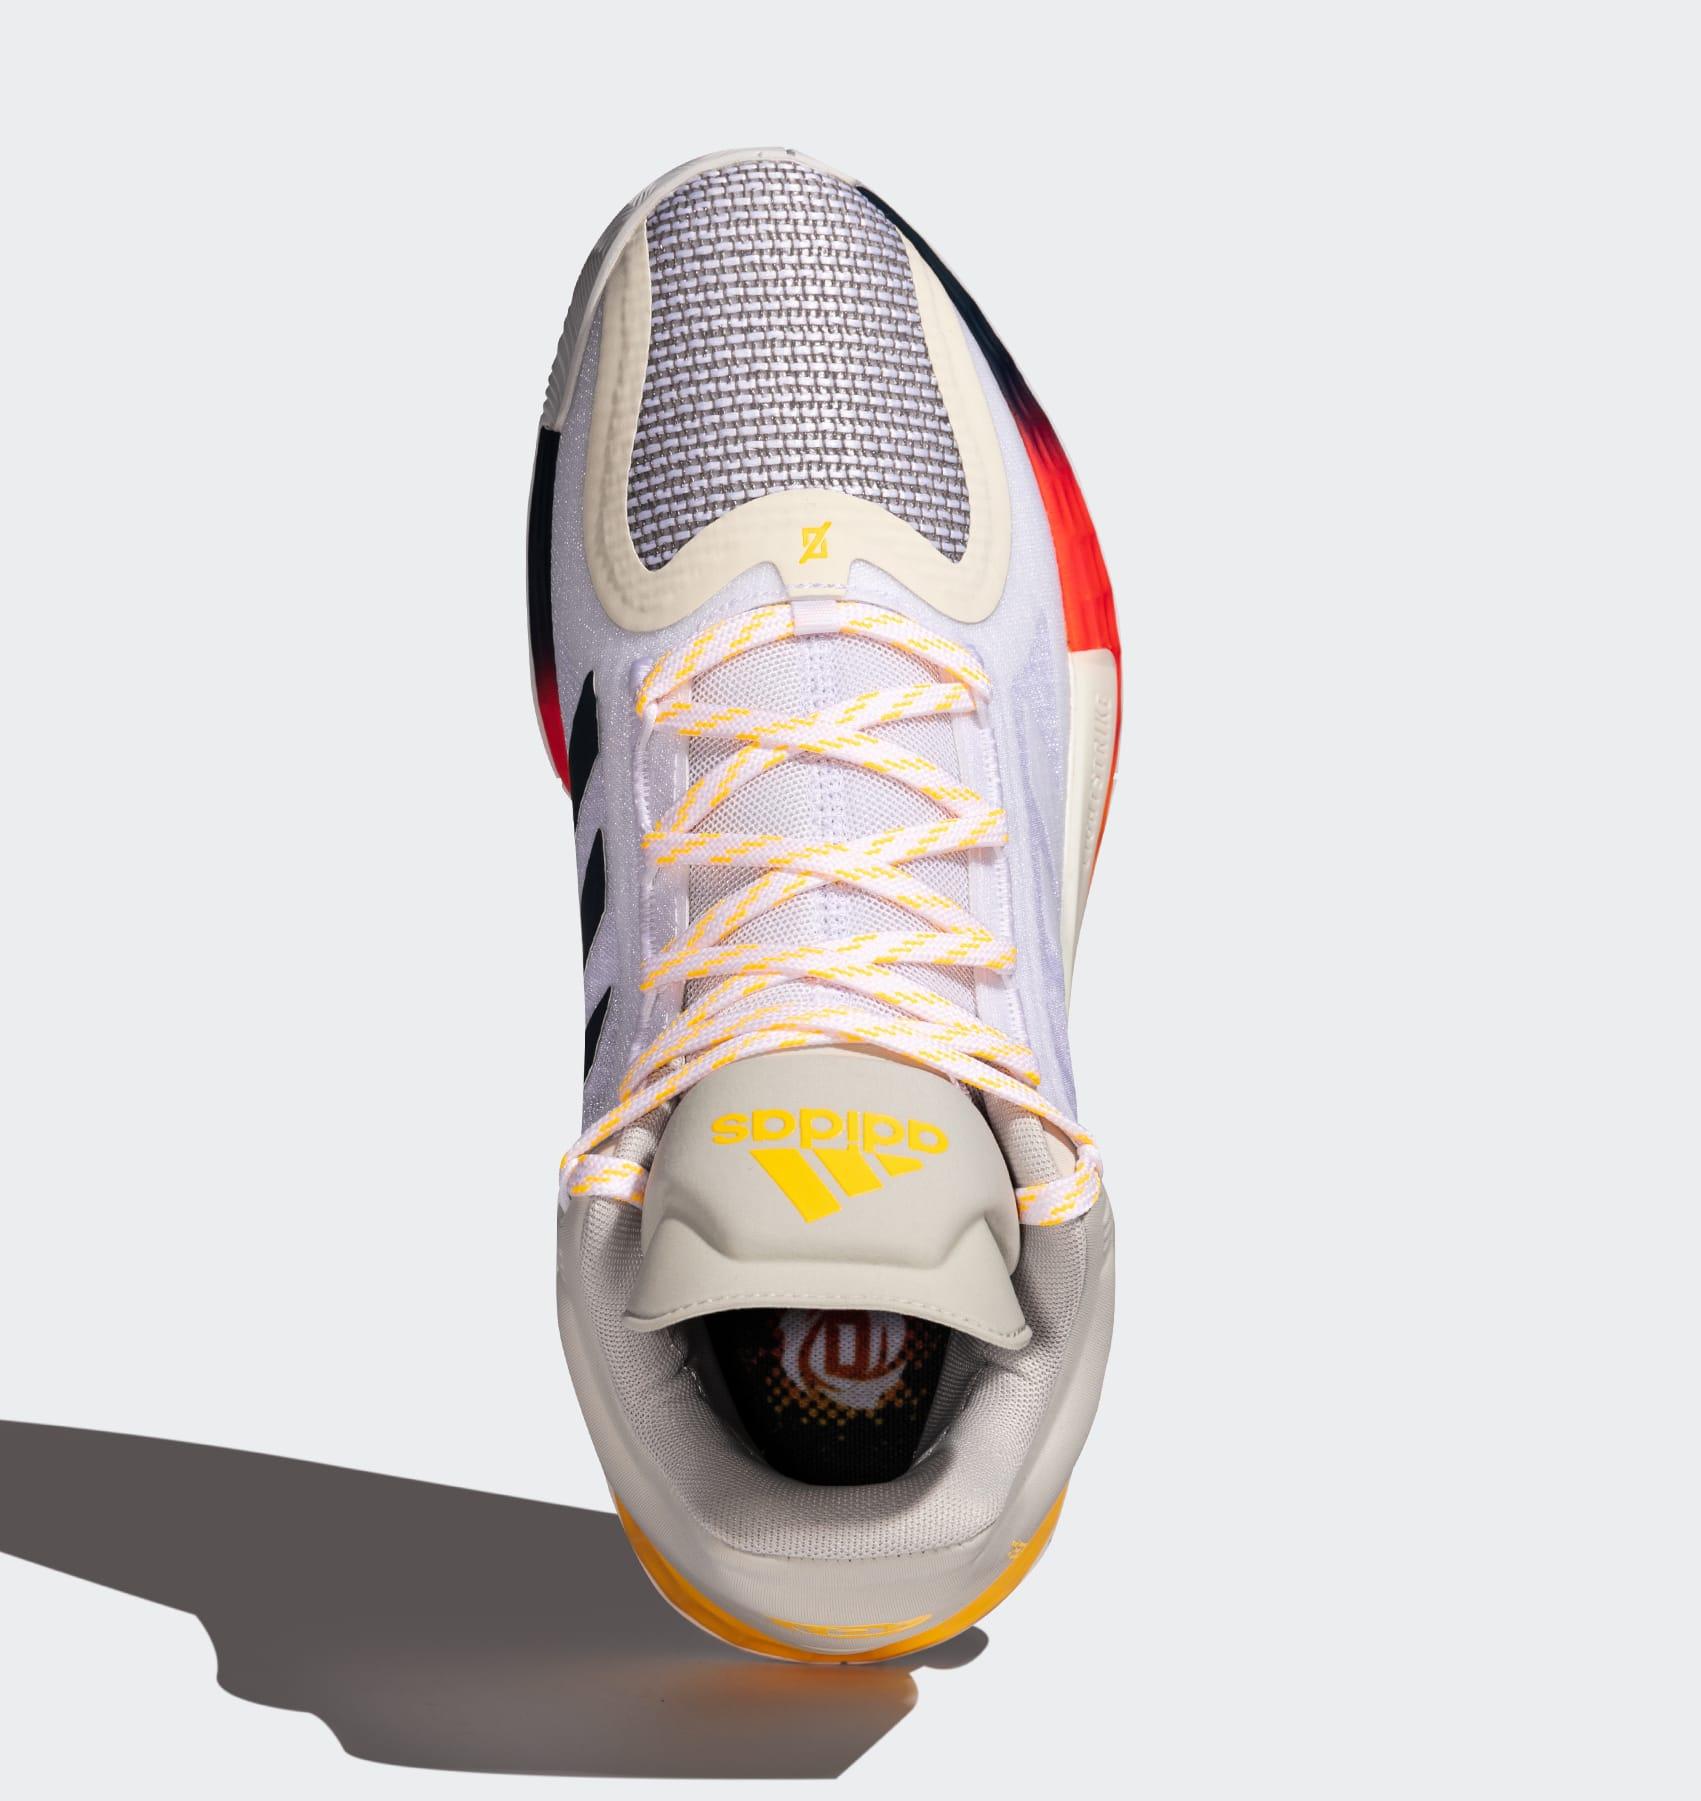 Adidas D Rose 11 'Ftwr White/Solar Gold/Tech Indigo' FW8508 Top